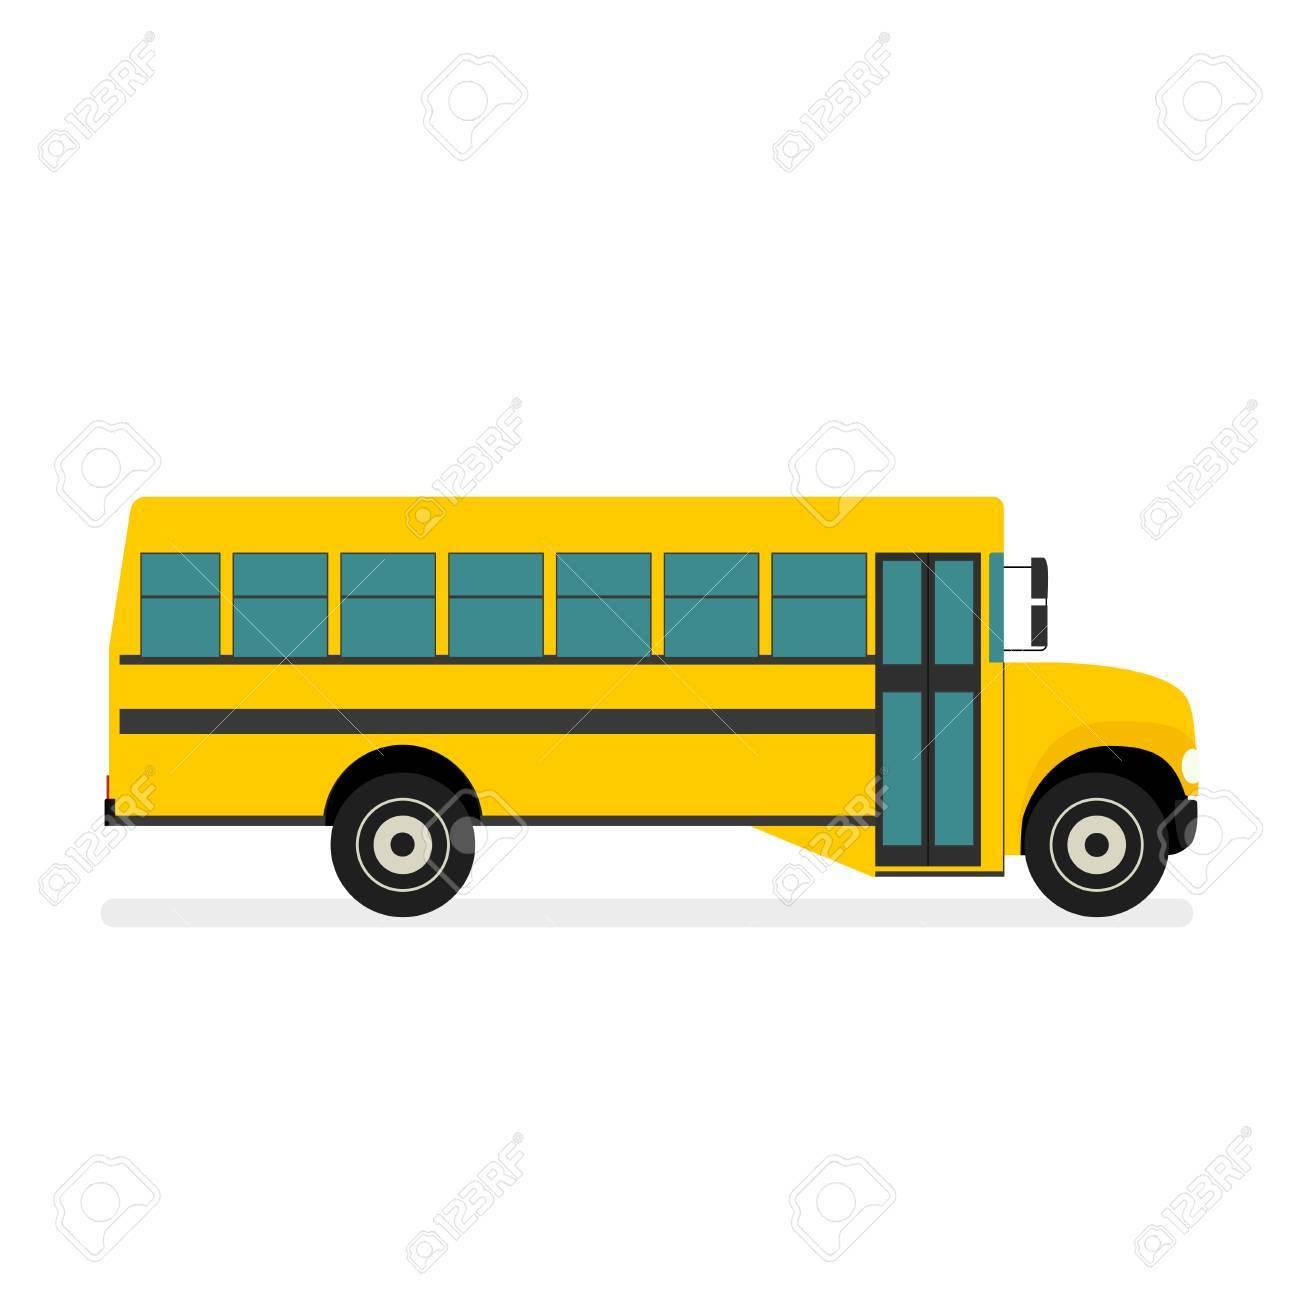 school bus vector royalty free cliparts vectors and stock rh 123rf com school bus vector ai school bus vector black and white